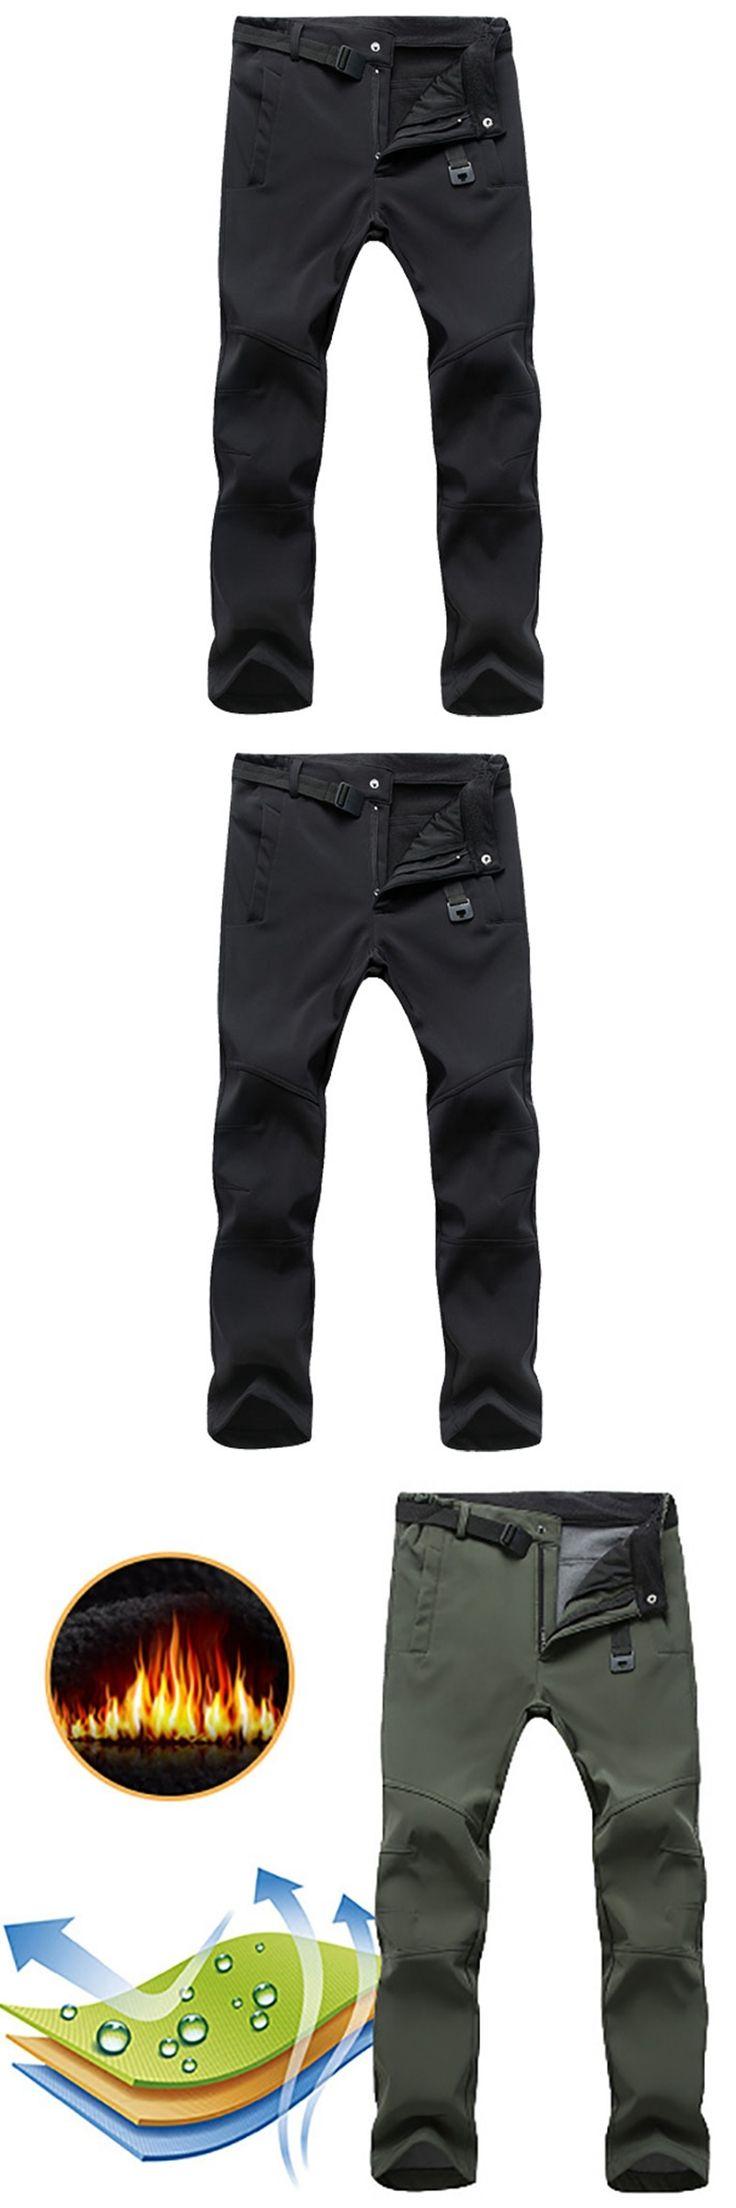 Hot Men Pants Waterproof Military Mens Casual Cargo Pants Warm Sweatpants Stretch Softshell Fleece Pants Skin Trousers